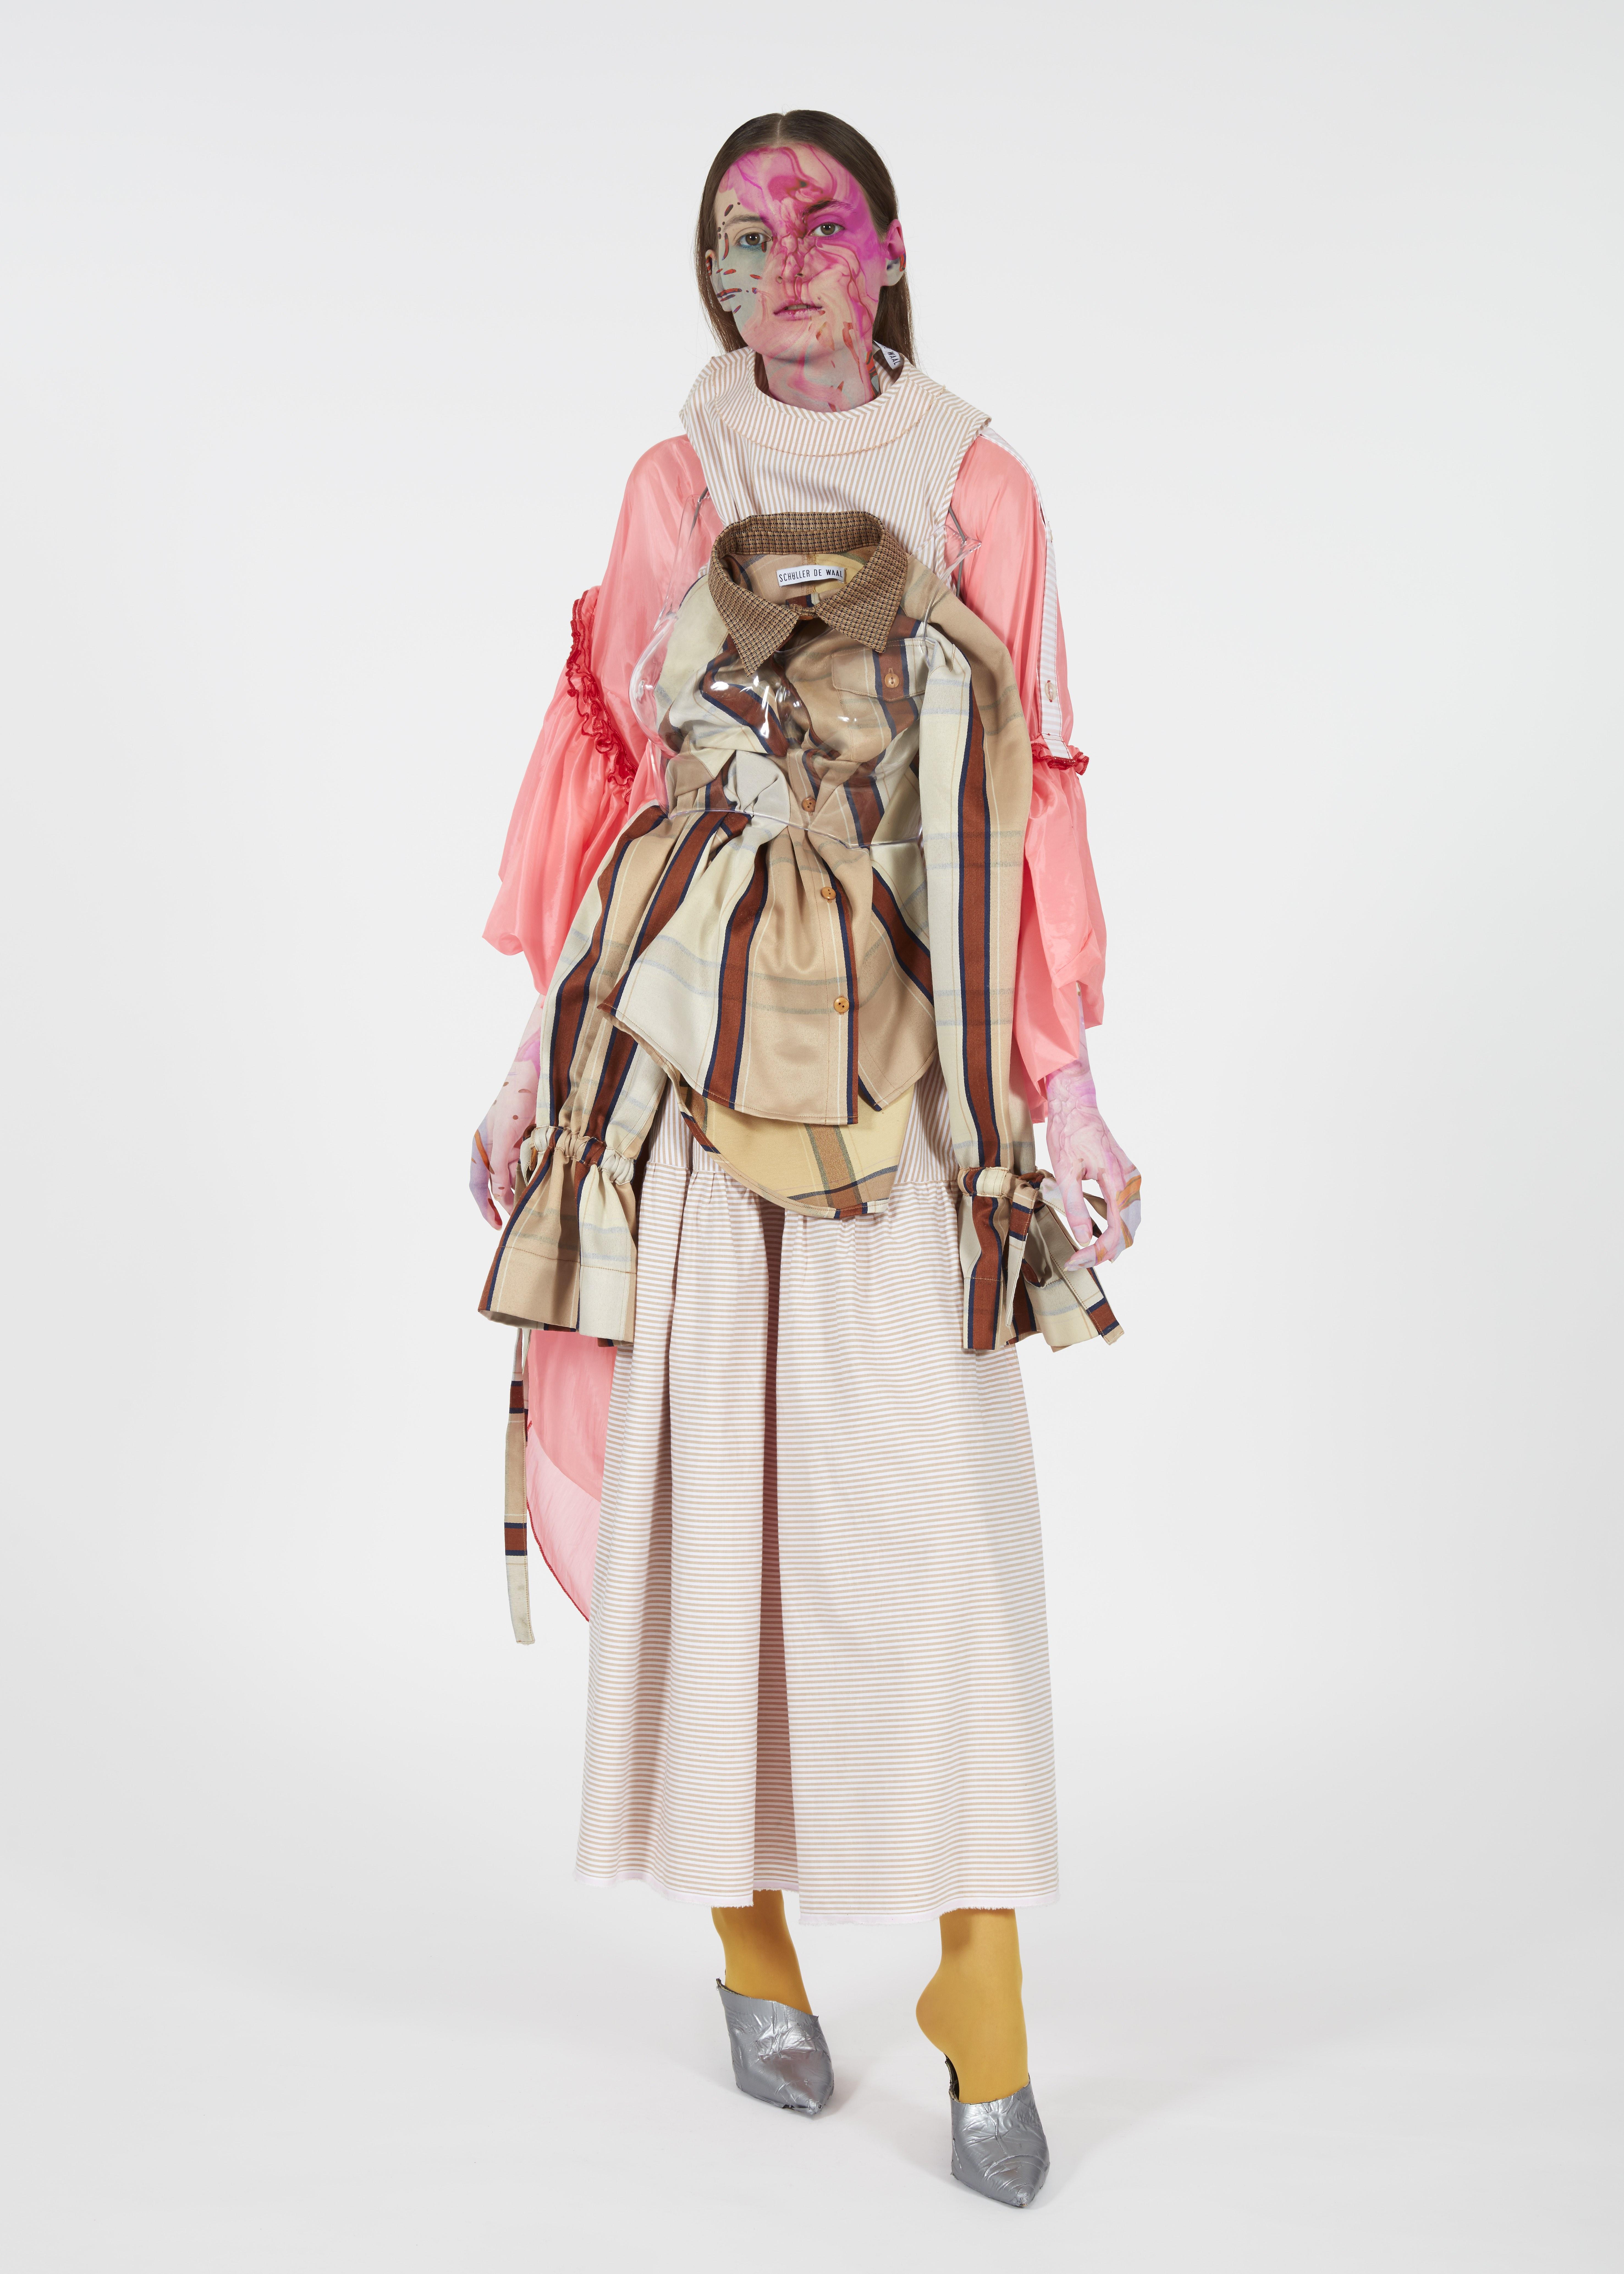 Schueller de Waal Fashion Therapy 6